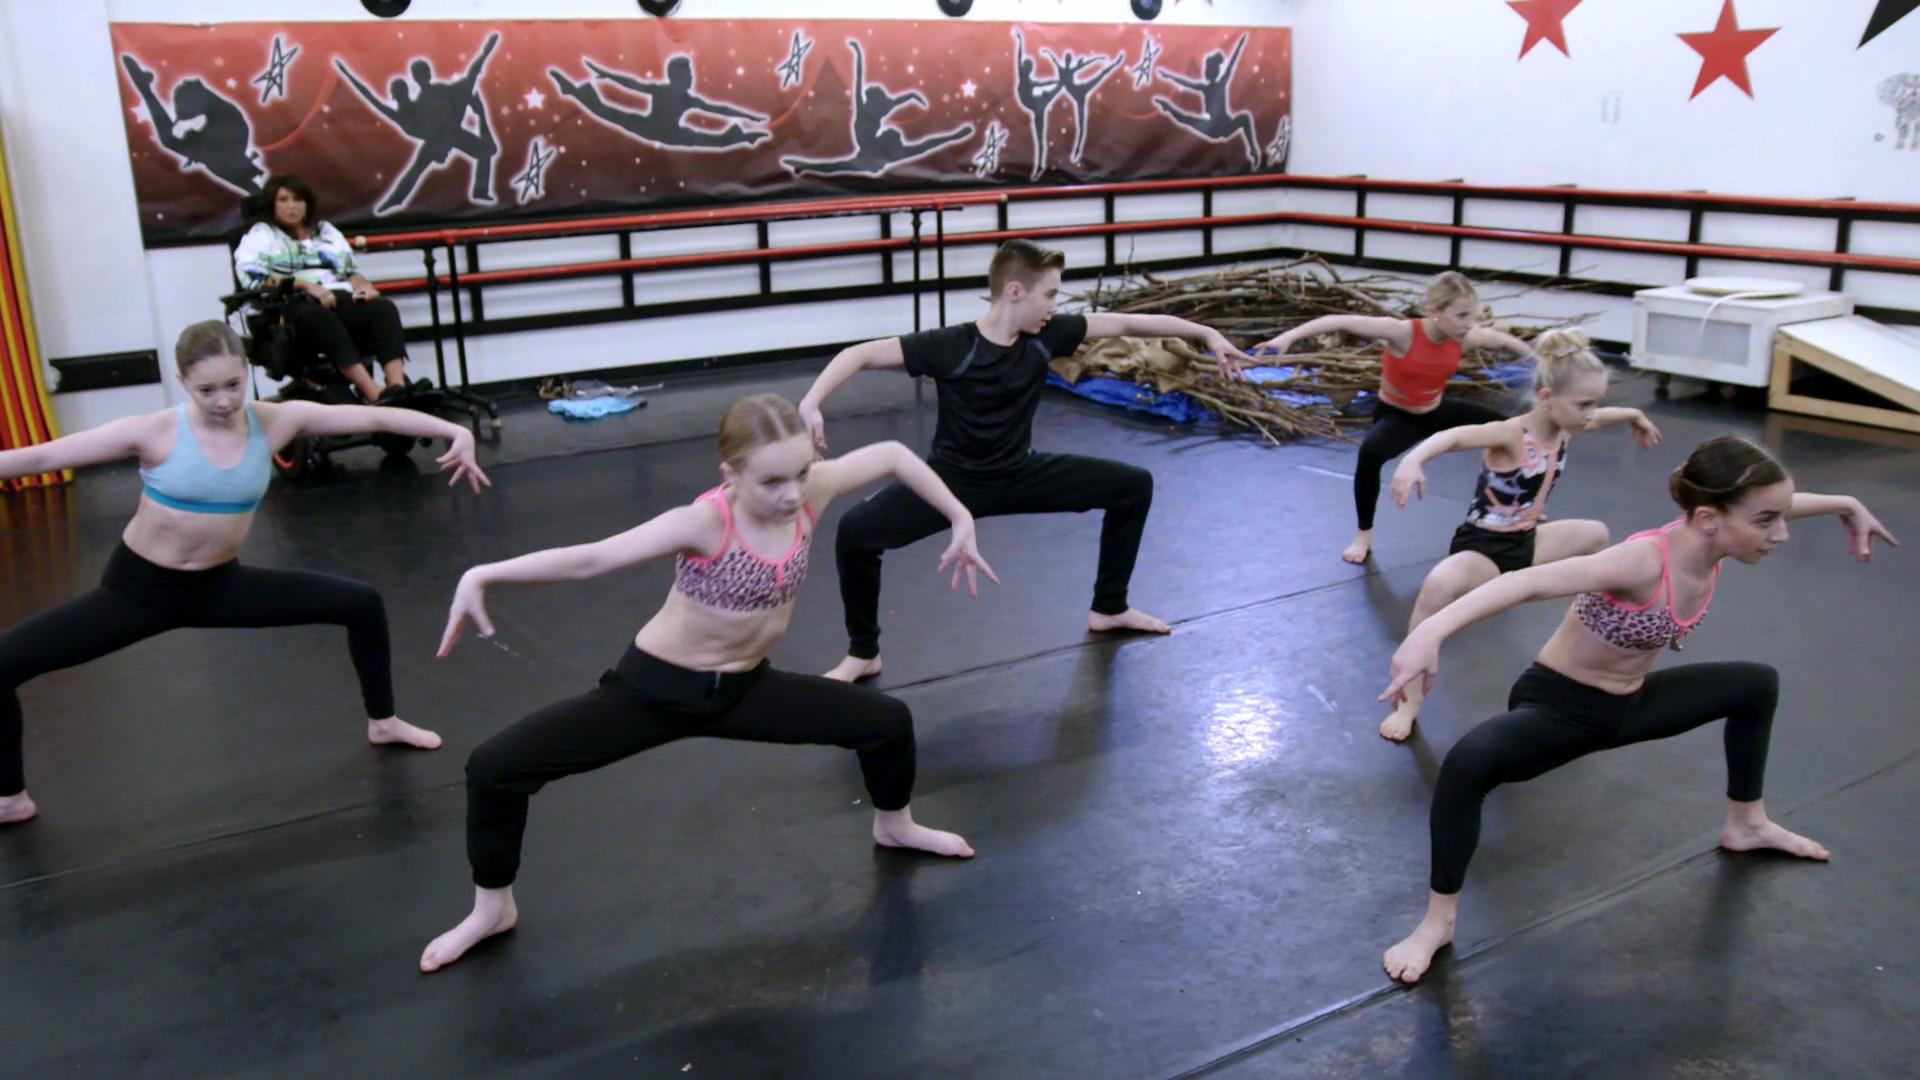 2 Jackets, 4 Dancers